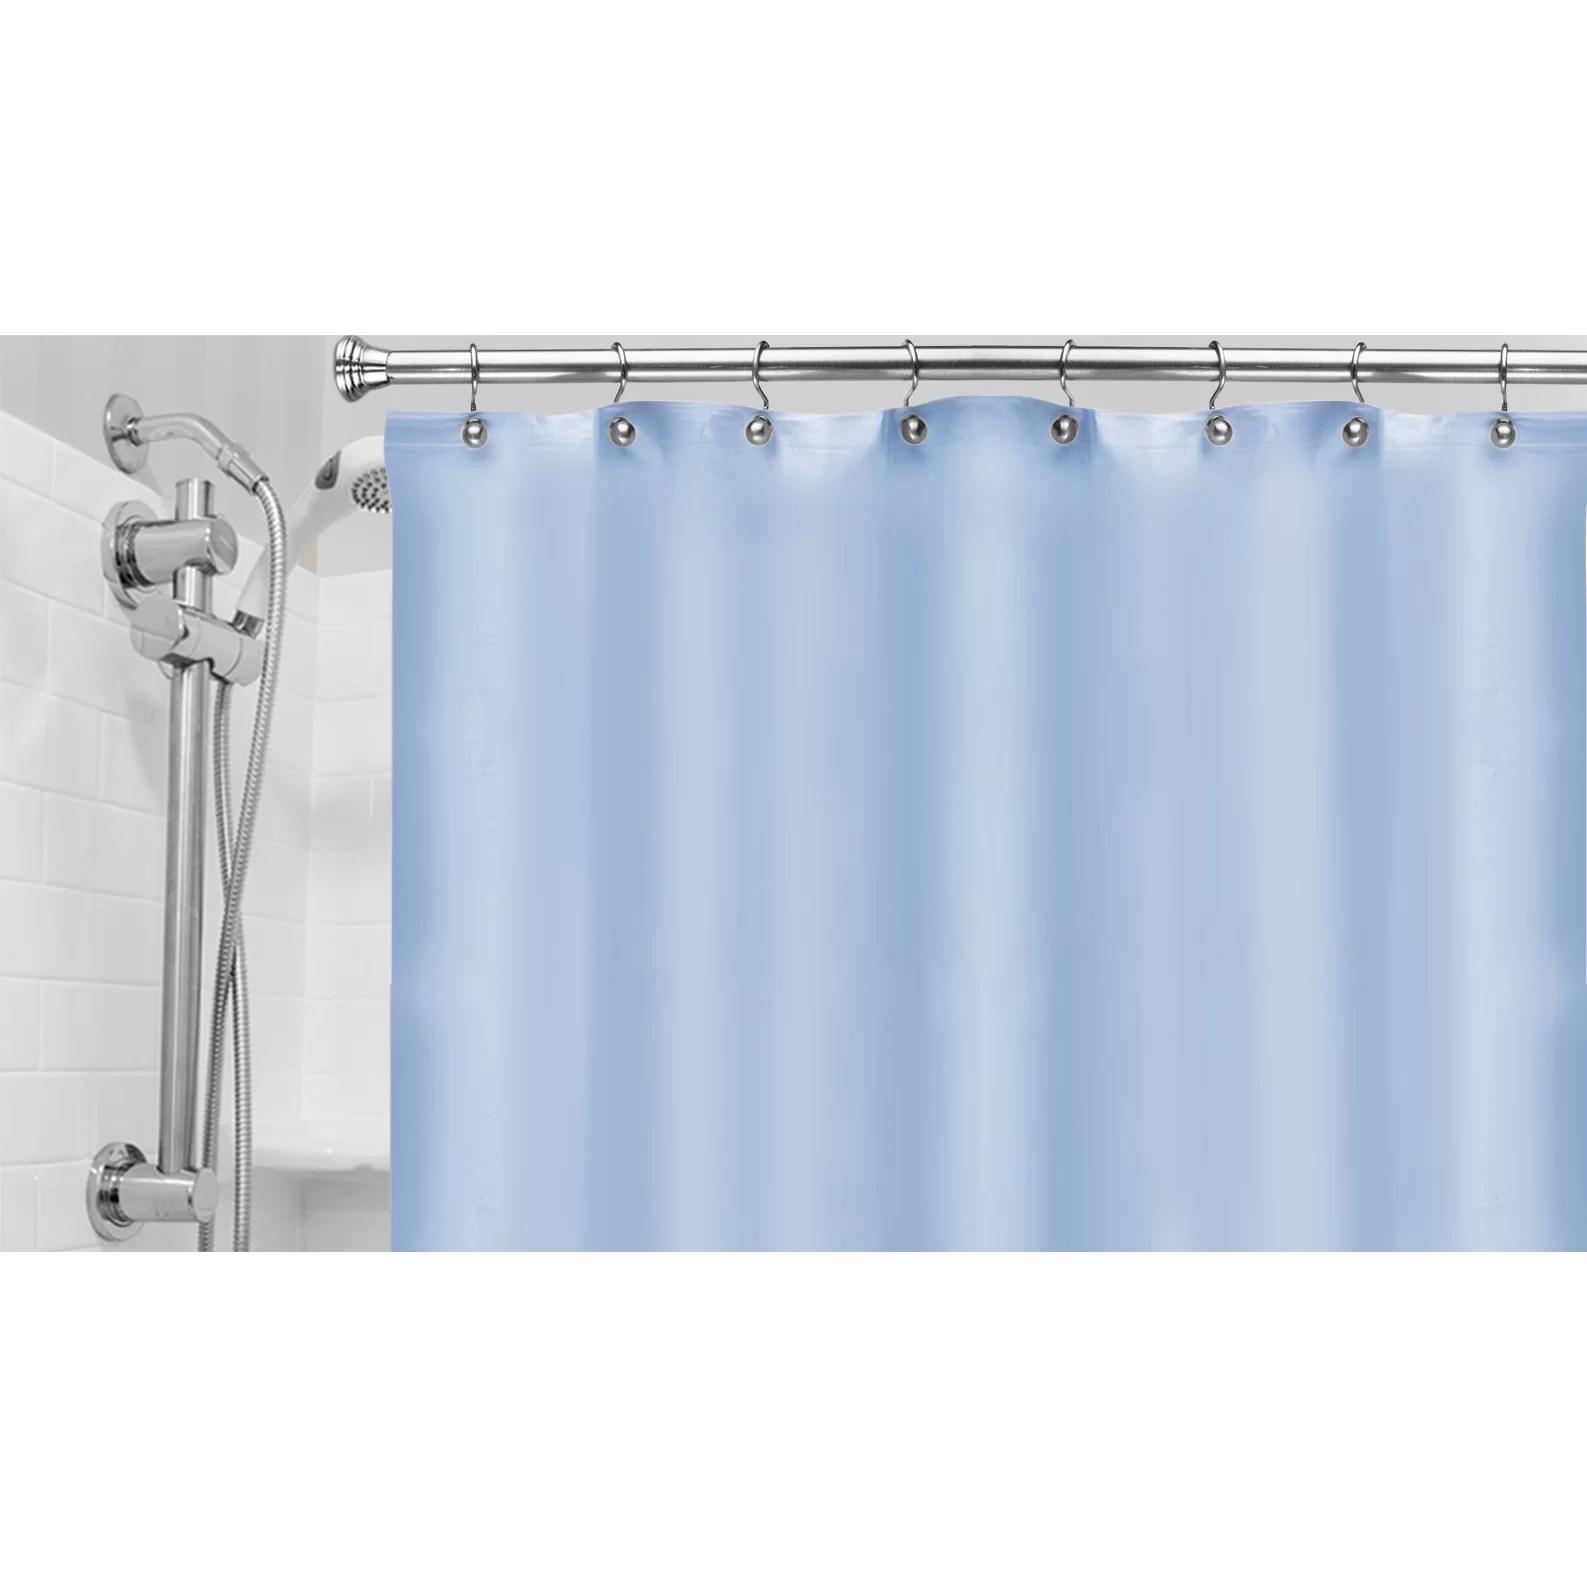 Popular Bath Products Vinyl Hotel Shower Curtain Liner